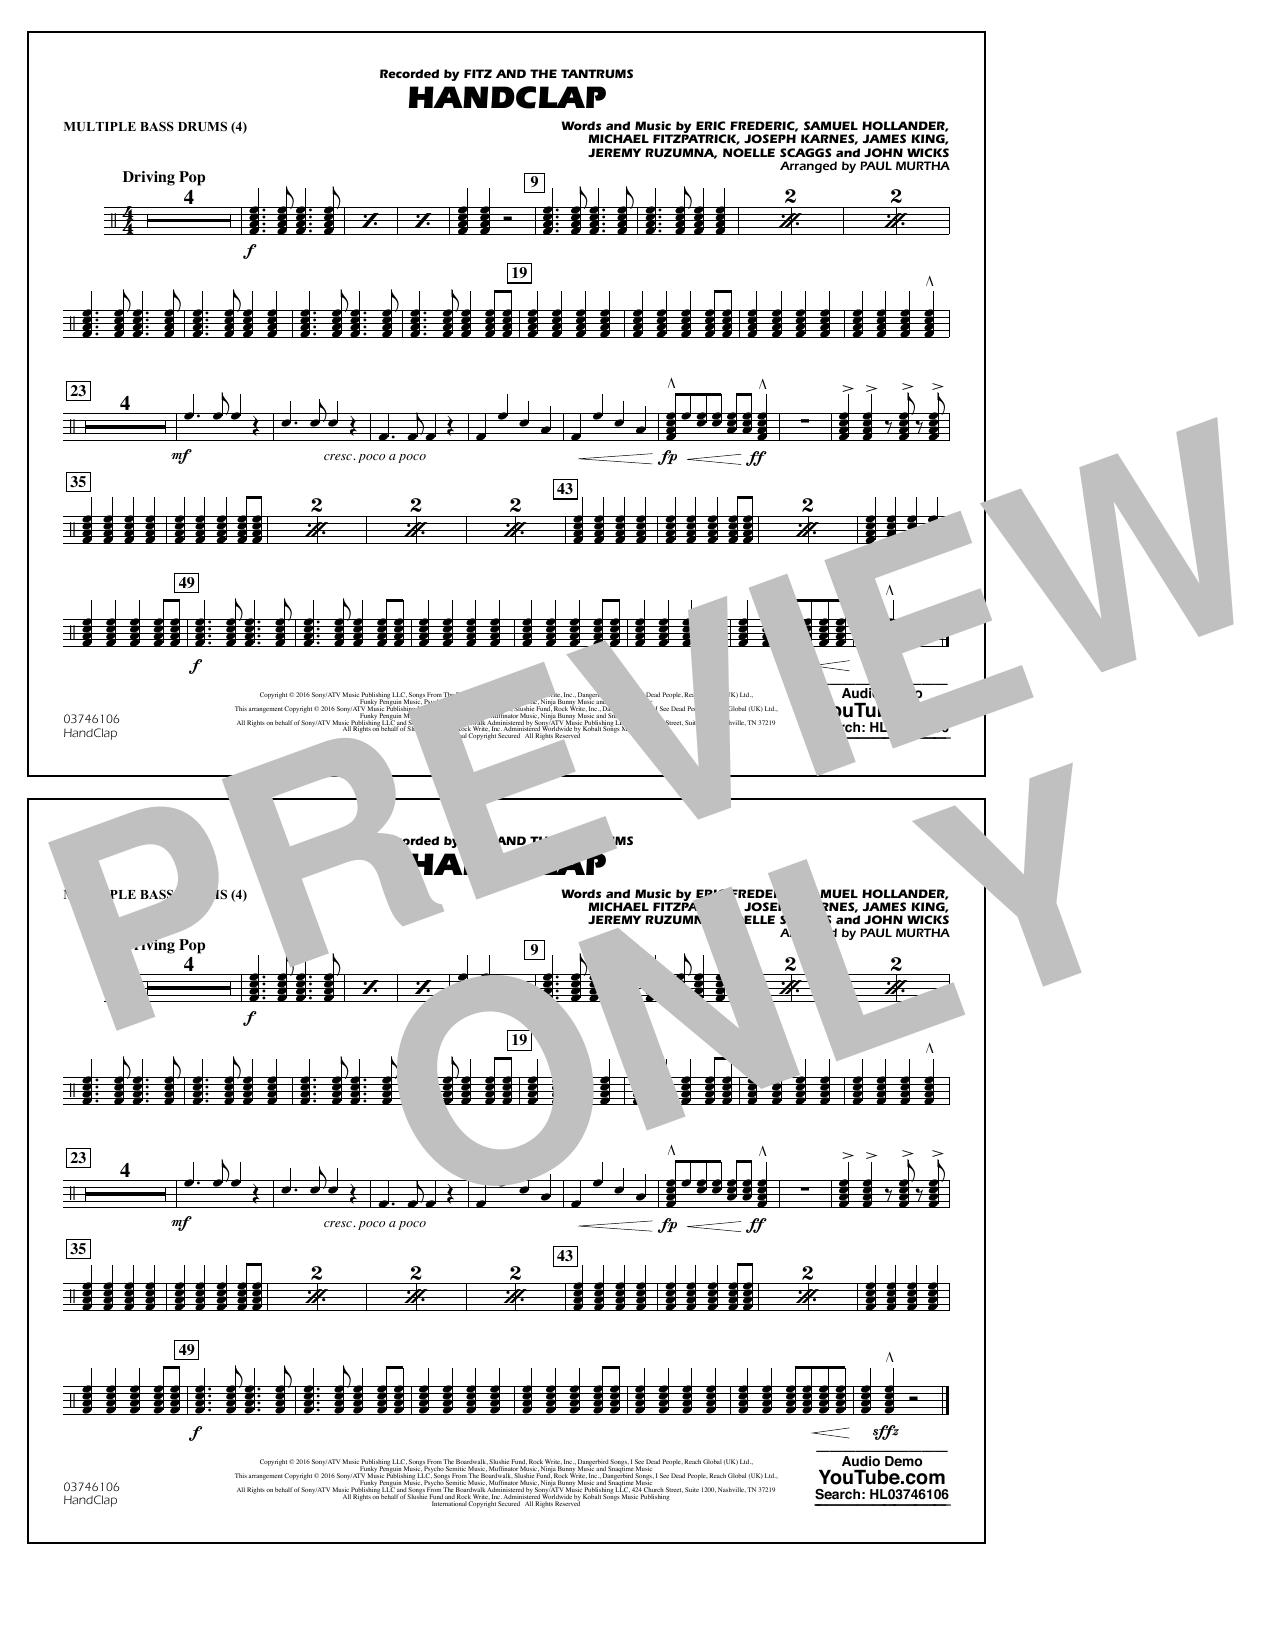 HandClap - Multiple Bass Drums Sheet Music